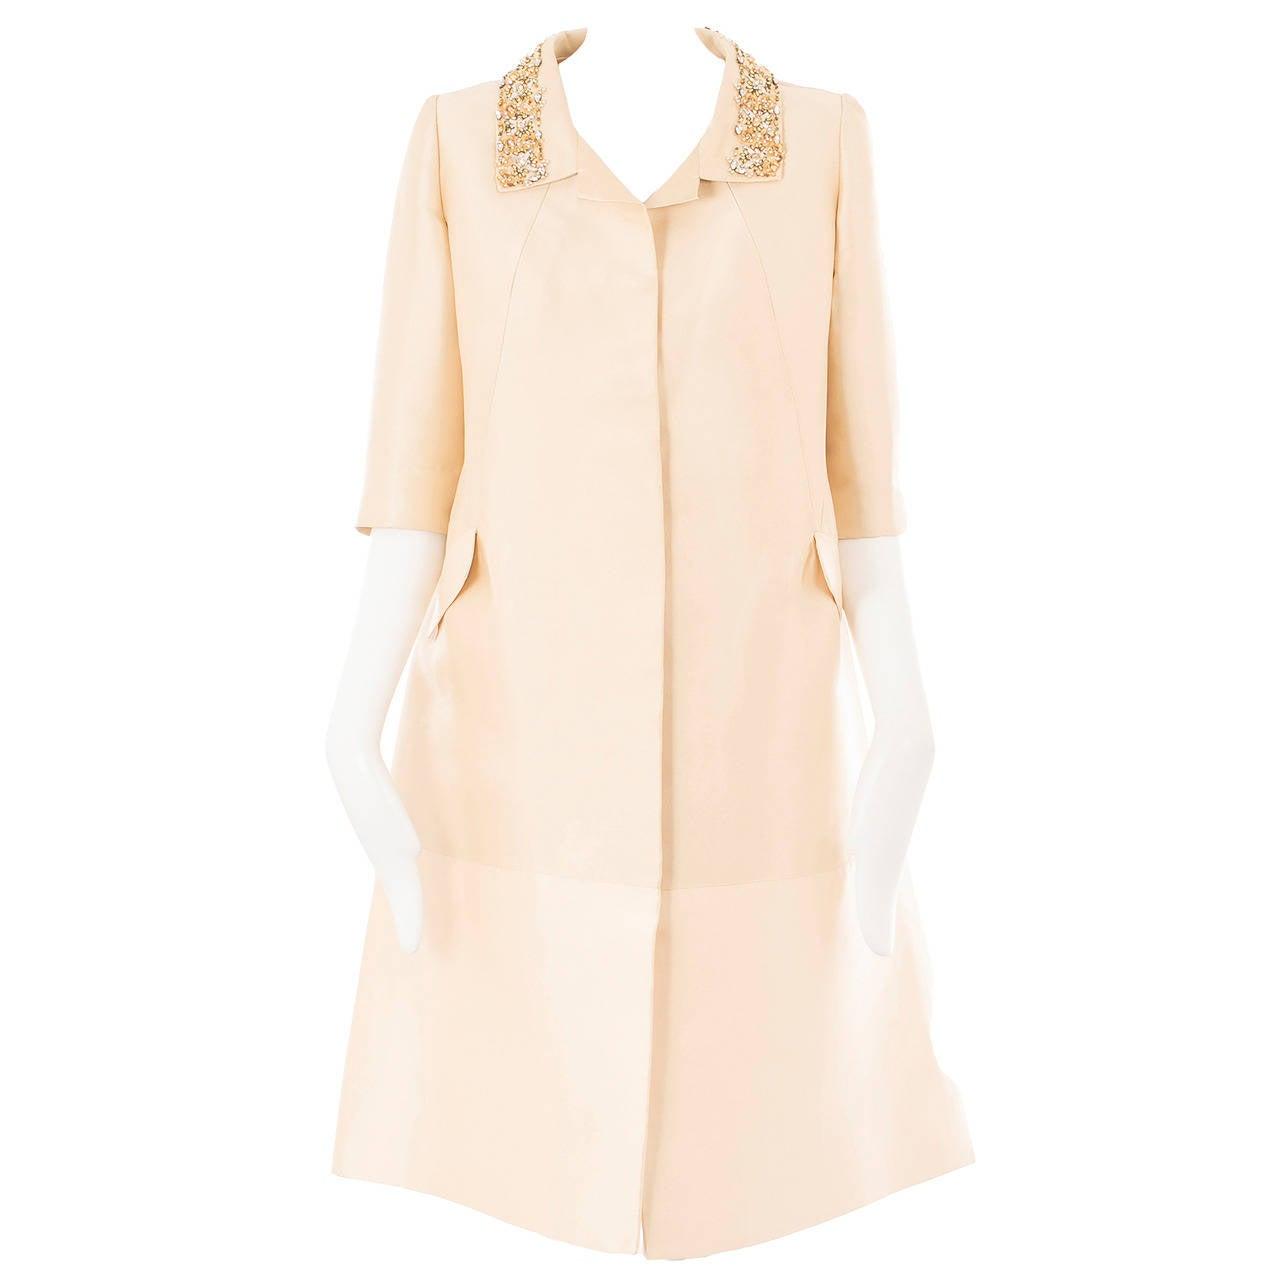 Lanvin Couture Ivory Silk Coat, Circa 1962 1